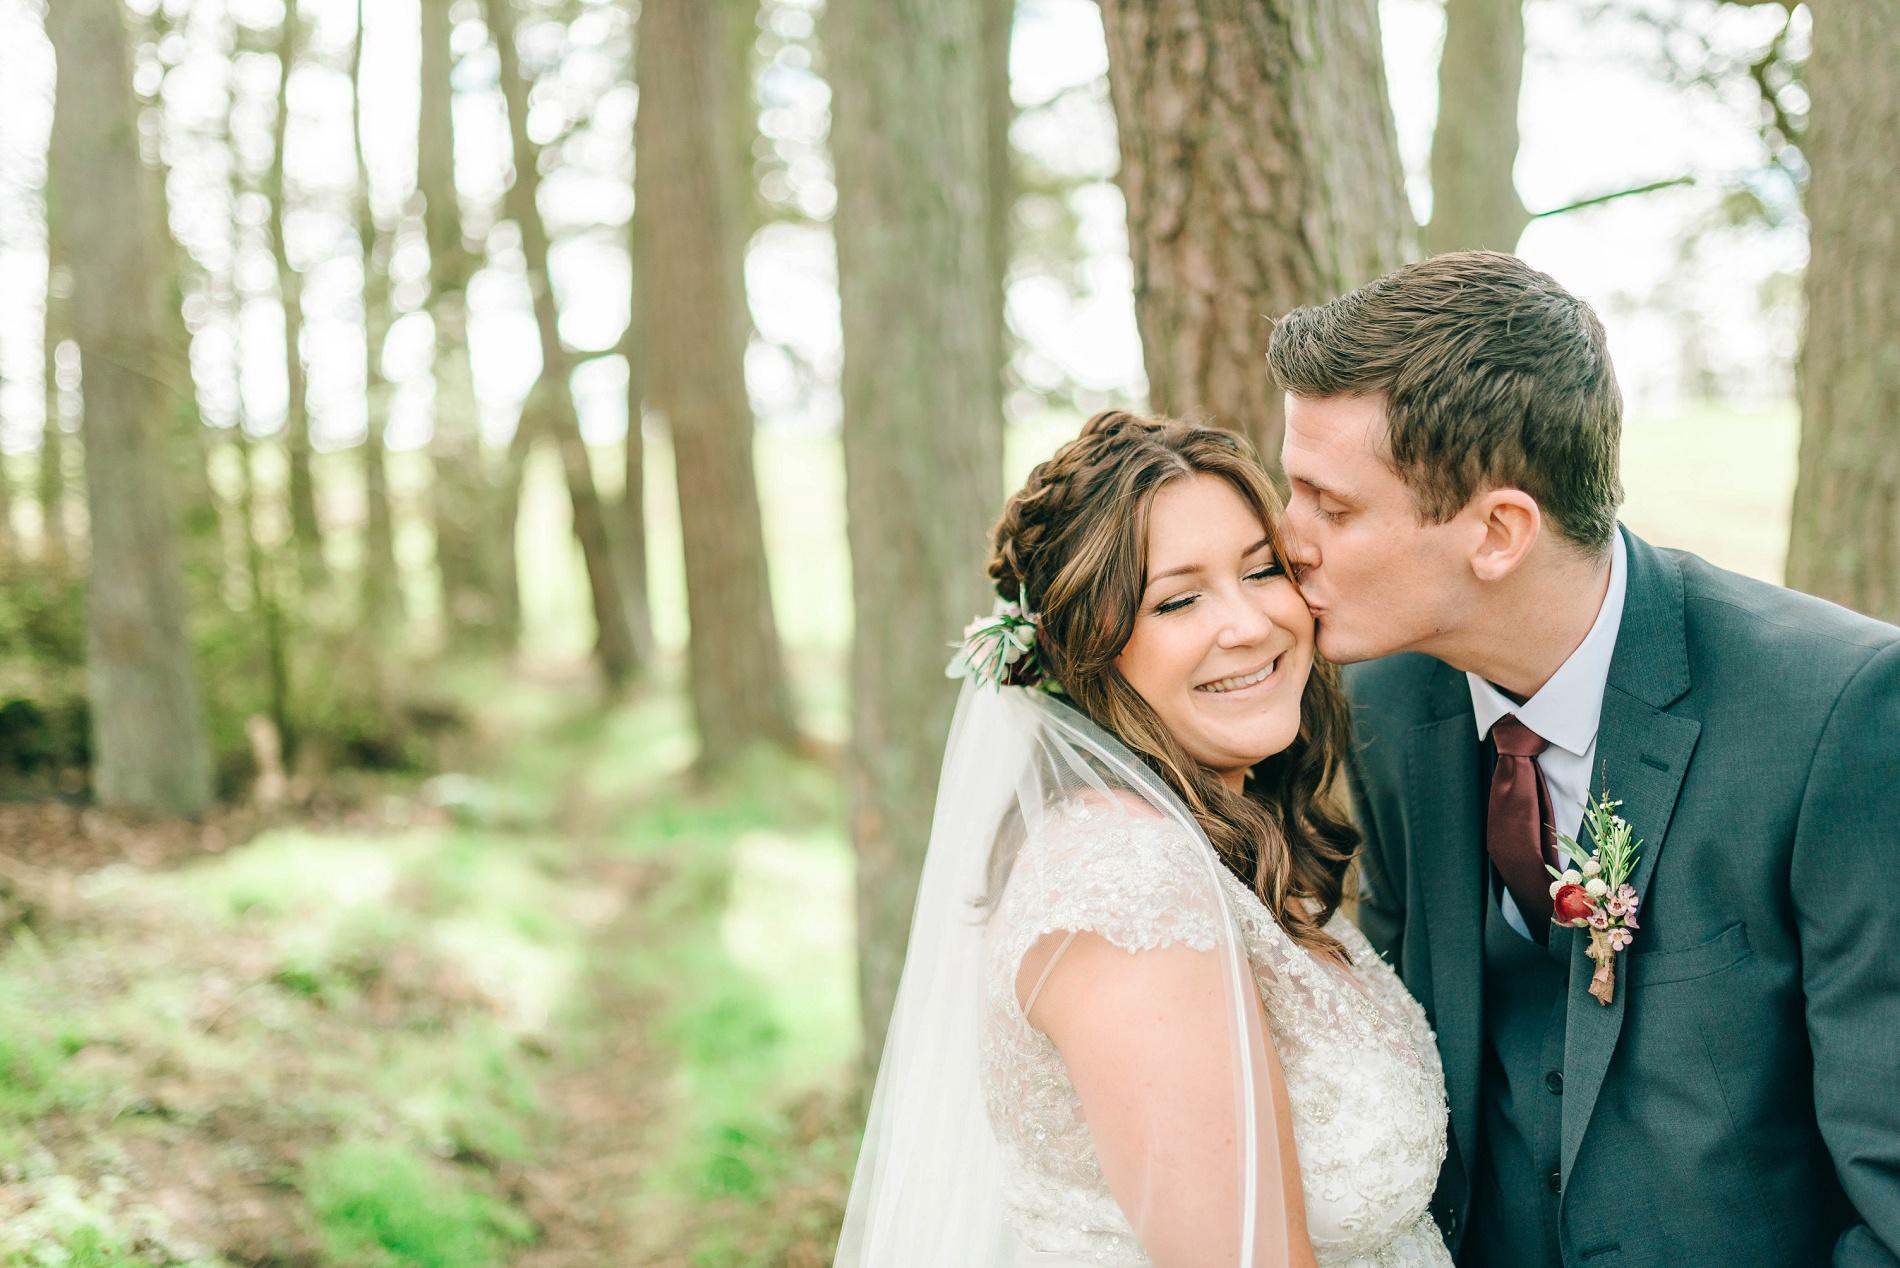 A Boho Wedding at Woodhill Hall (c) Matt Ethan (56)